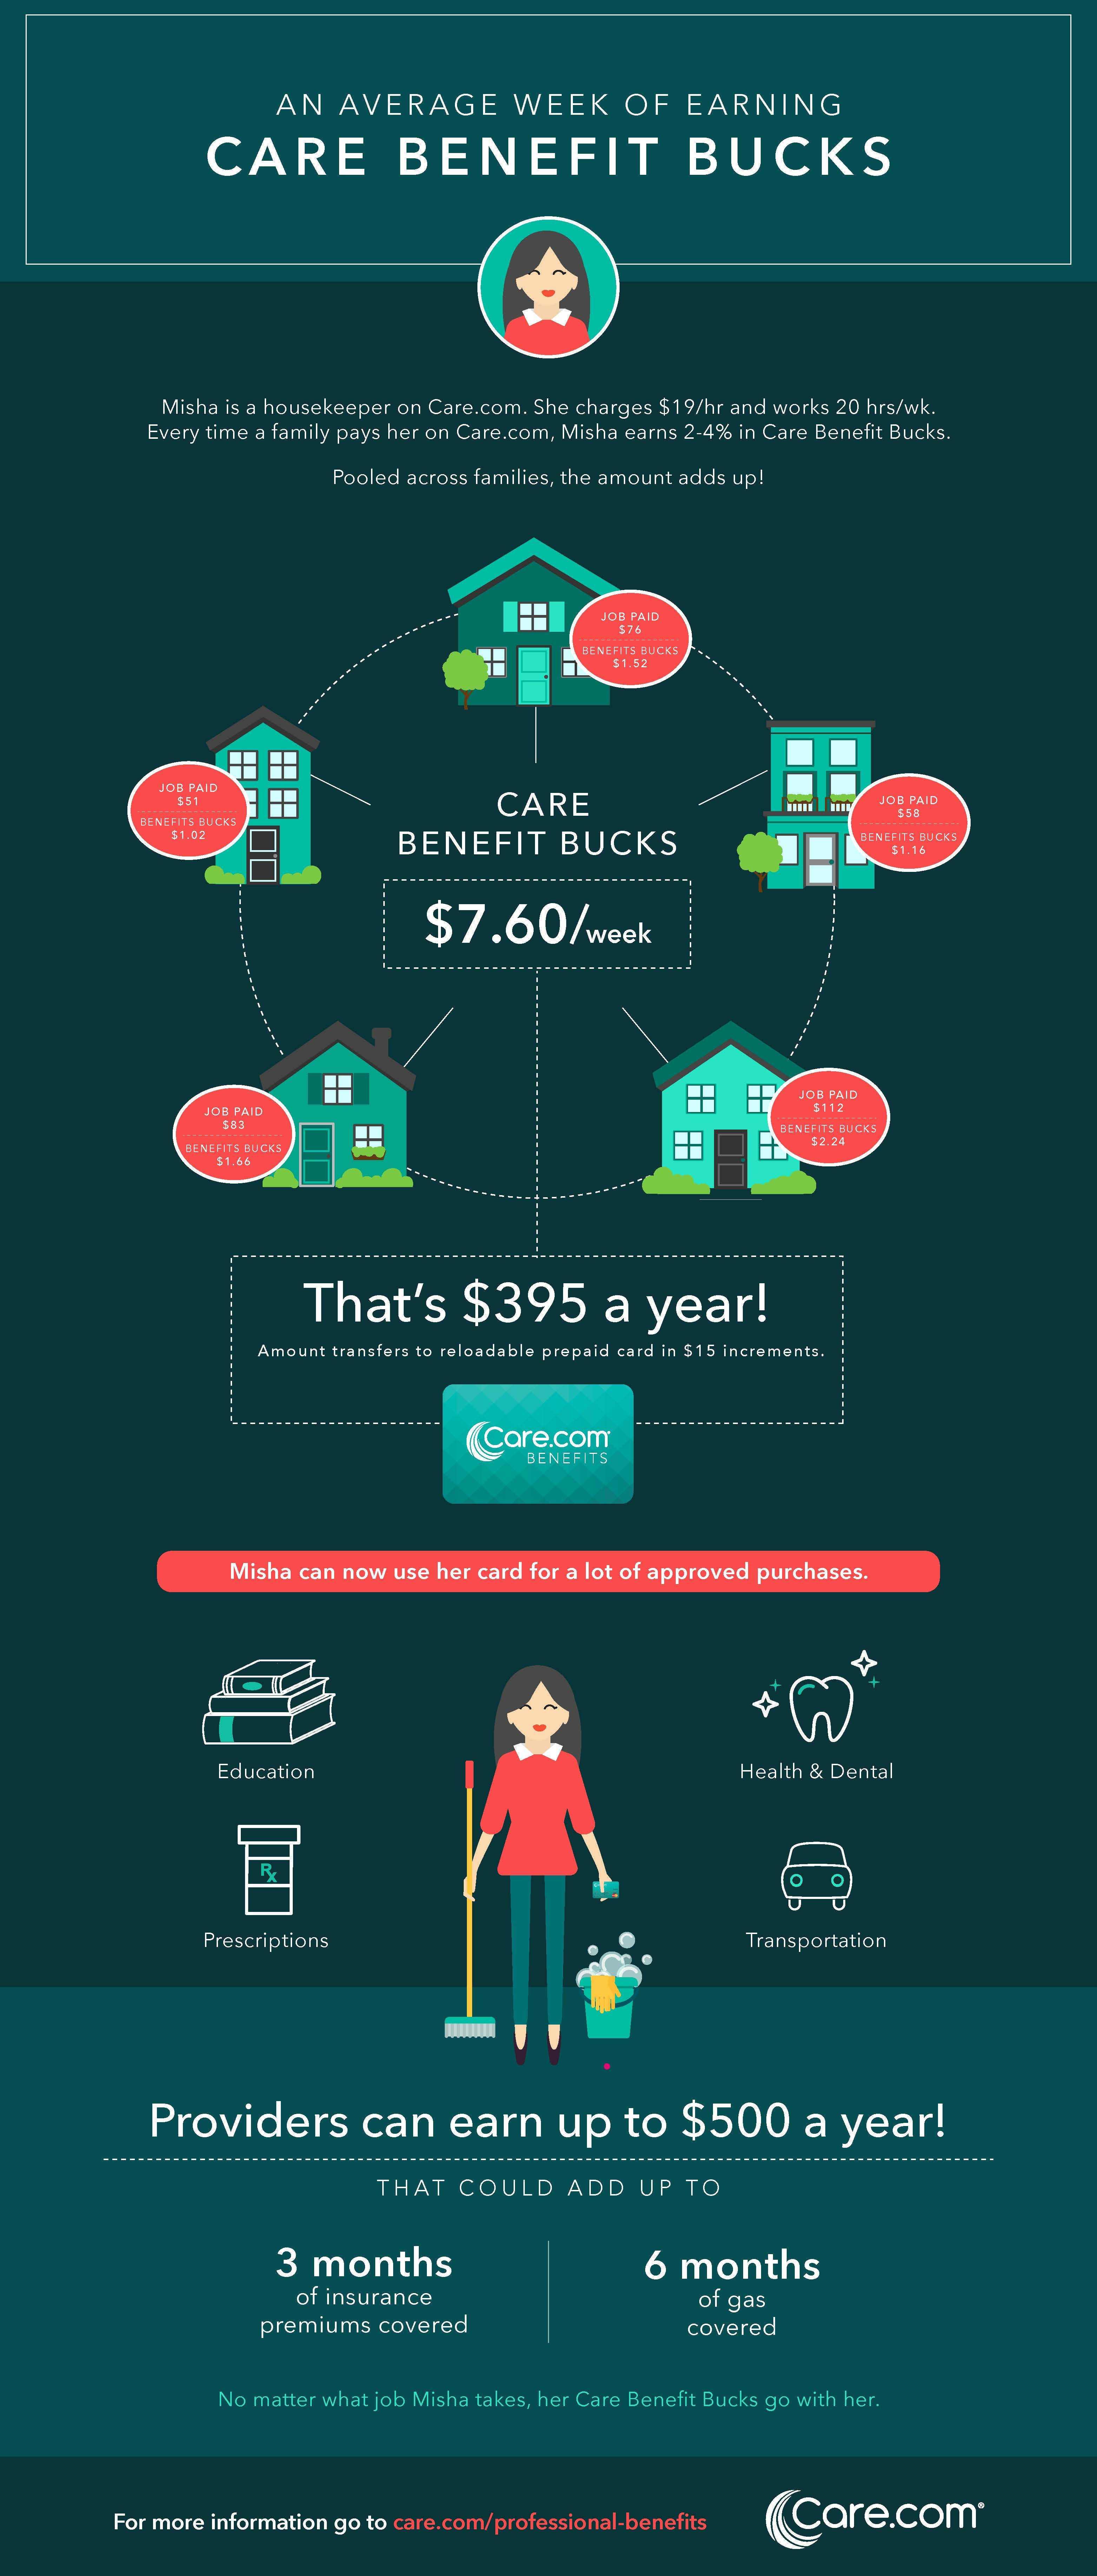 Care.com Introduces Groundbreaking Peer-to-Peer Benefits Platform ...